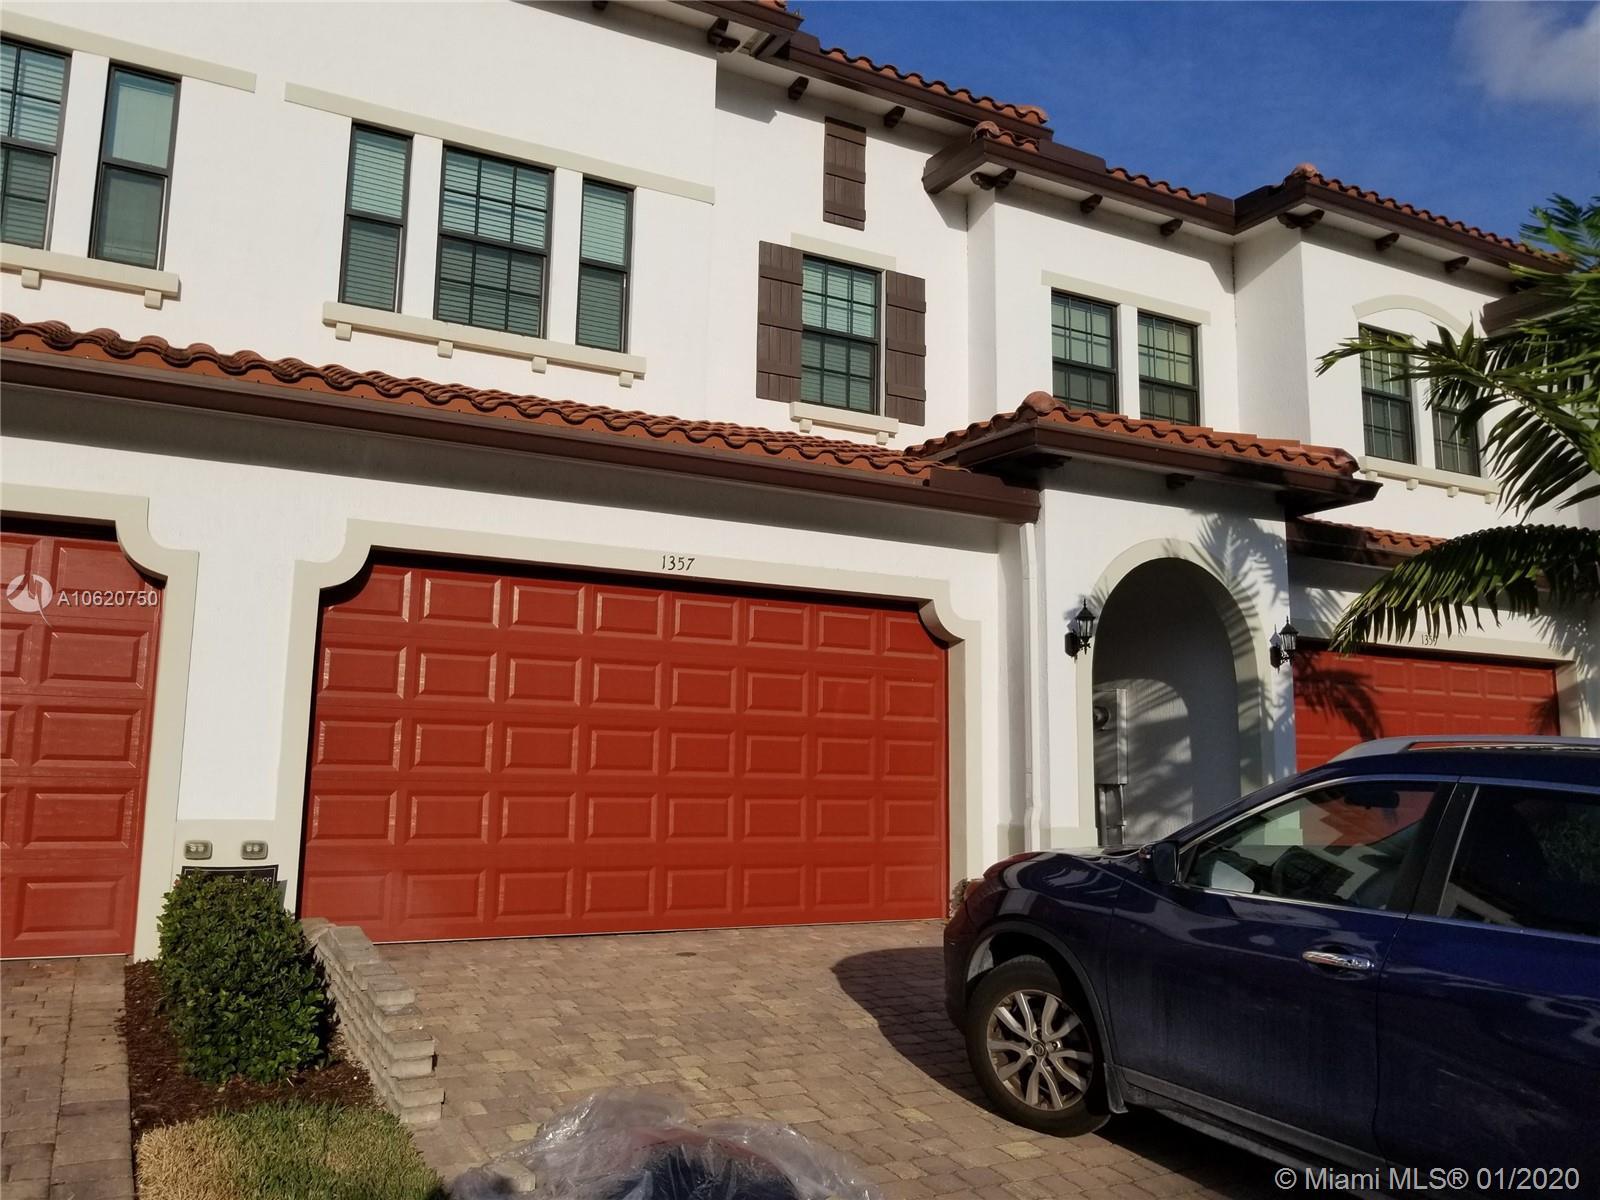 1357 SW 113th Ave, Pembroke Pines, FL 33025